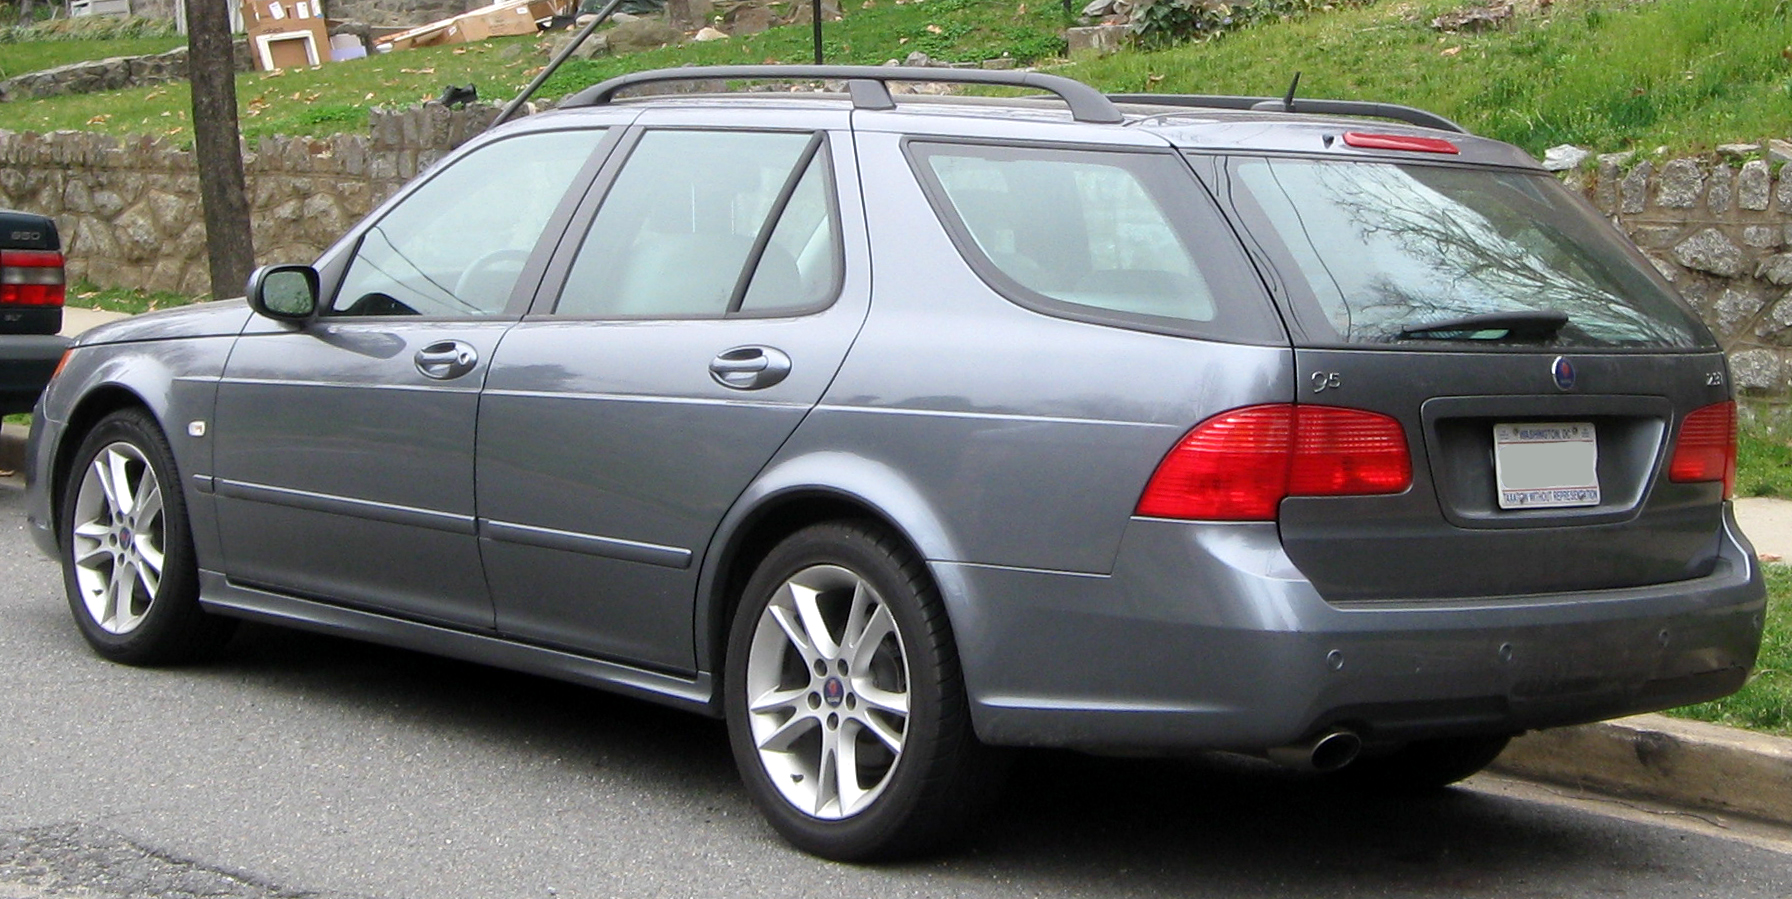 File 2006 2010 saab 9 5 wagon 03 16 2012 jpg wikimedia commons